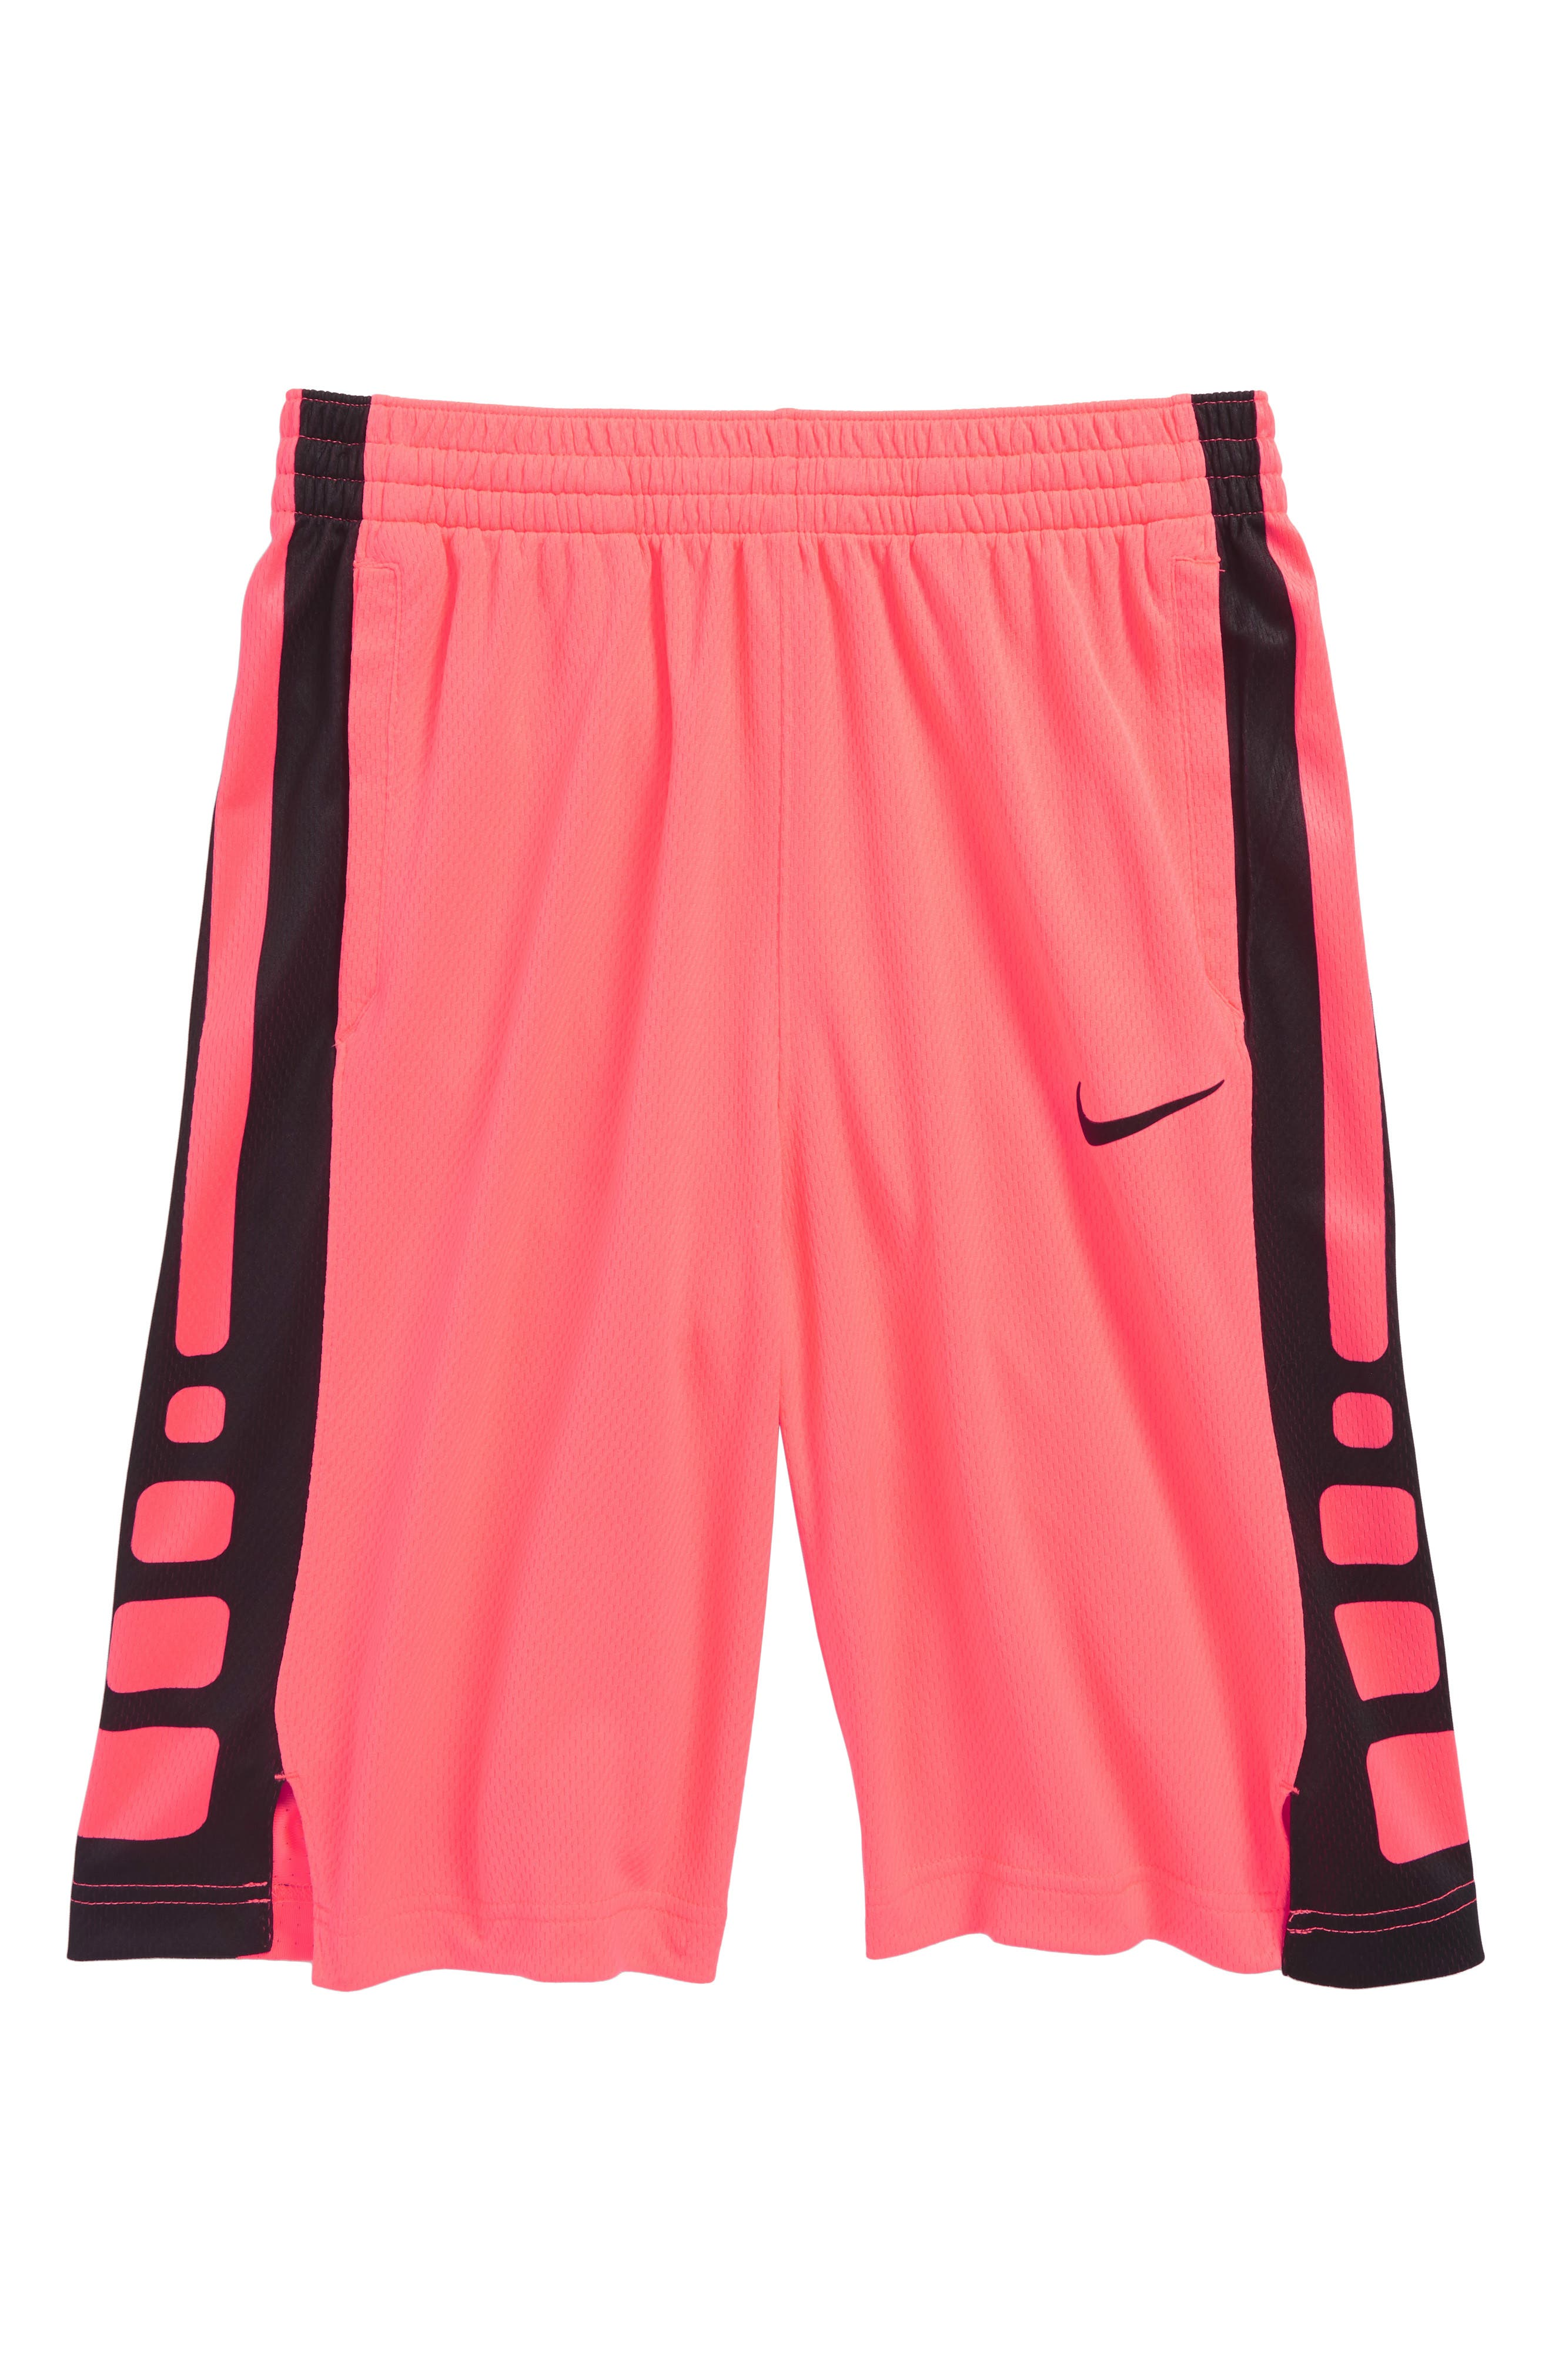 Dry Elite Basketball Shorts,                             Main thumbnail 1, color,                             Hot Punch/ Black